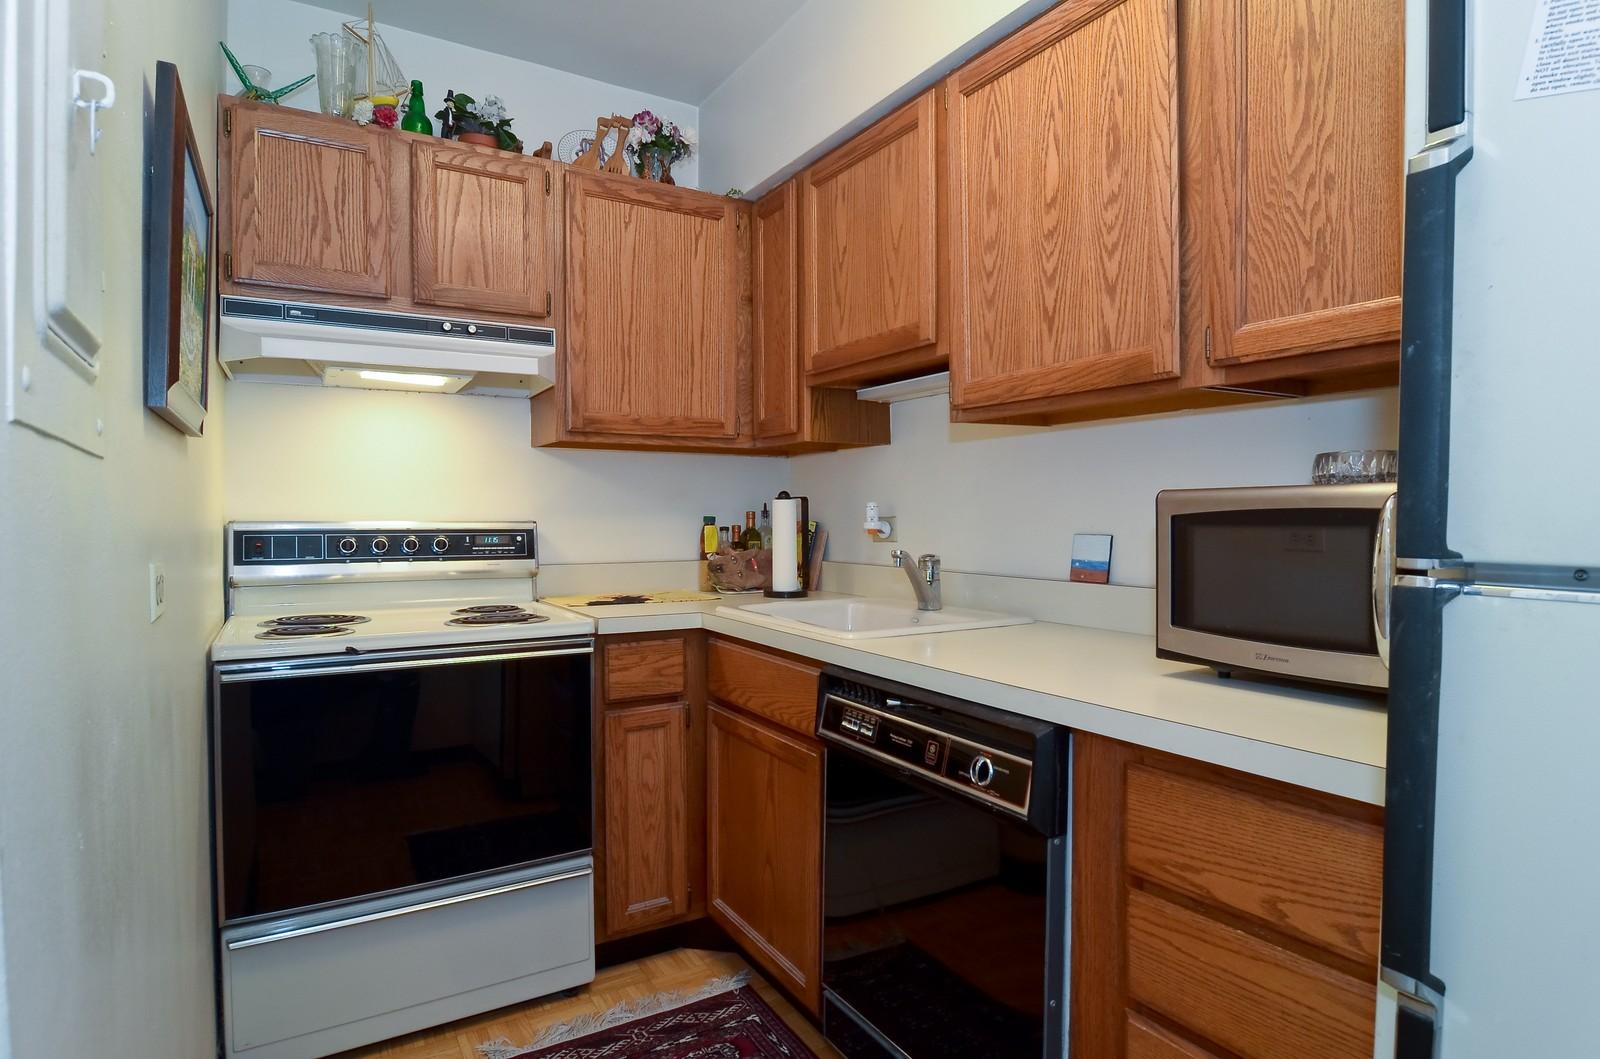 Real Estate Photography - 1550 N Lakeshore Dr, Unit 2E, Chicago, IL, 60610 - Kitchen